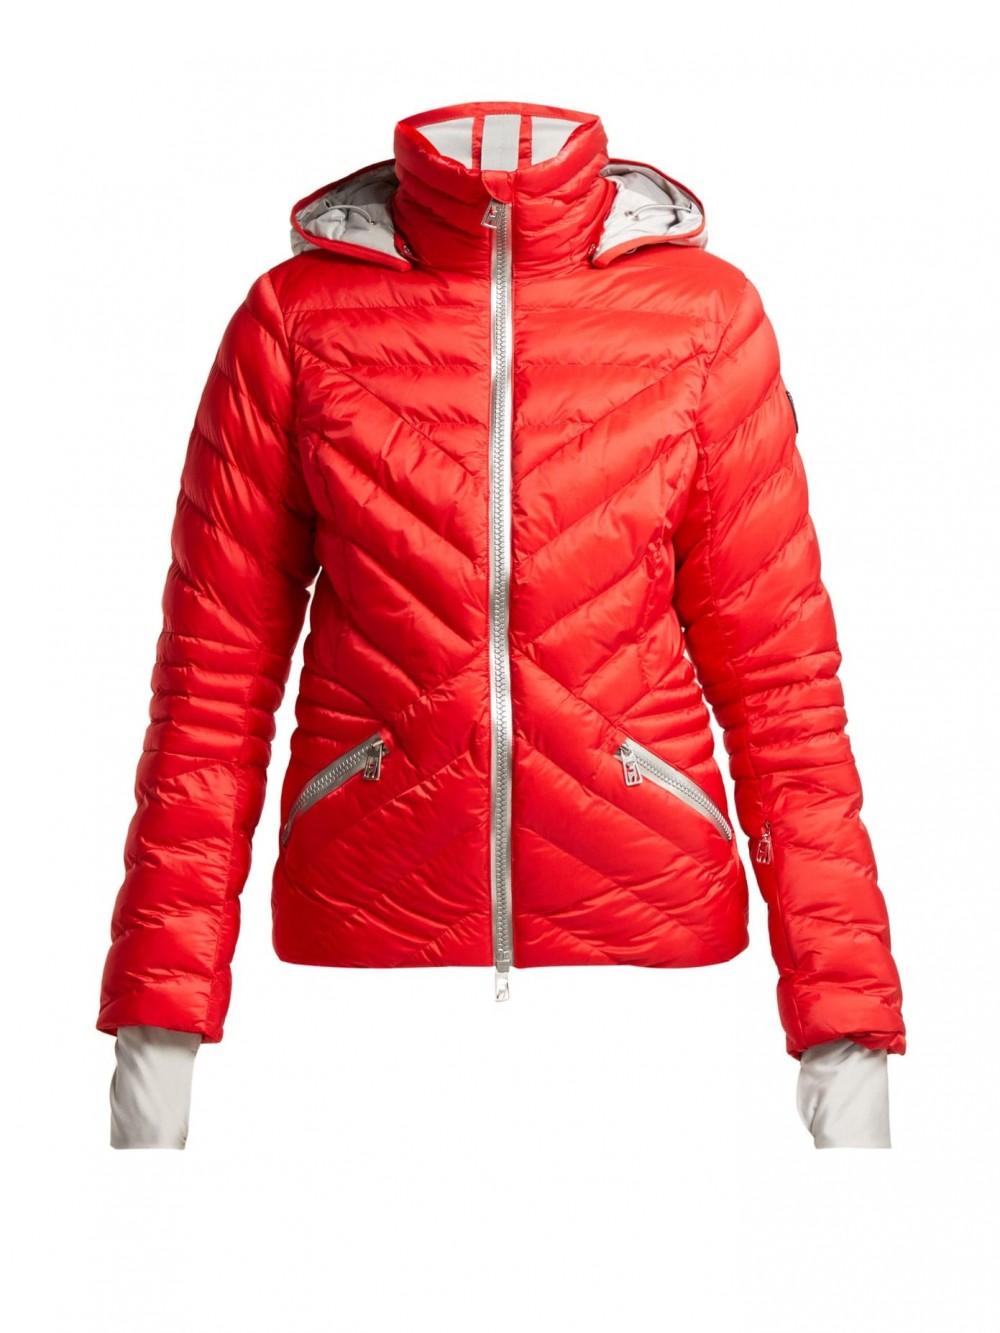 Куртка TONI SAILER clementine quilted ski jacket lady (размер 36/S) - 13